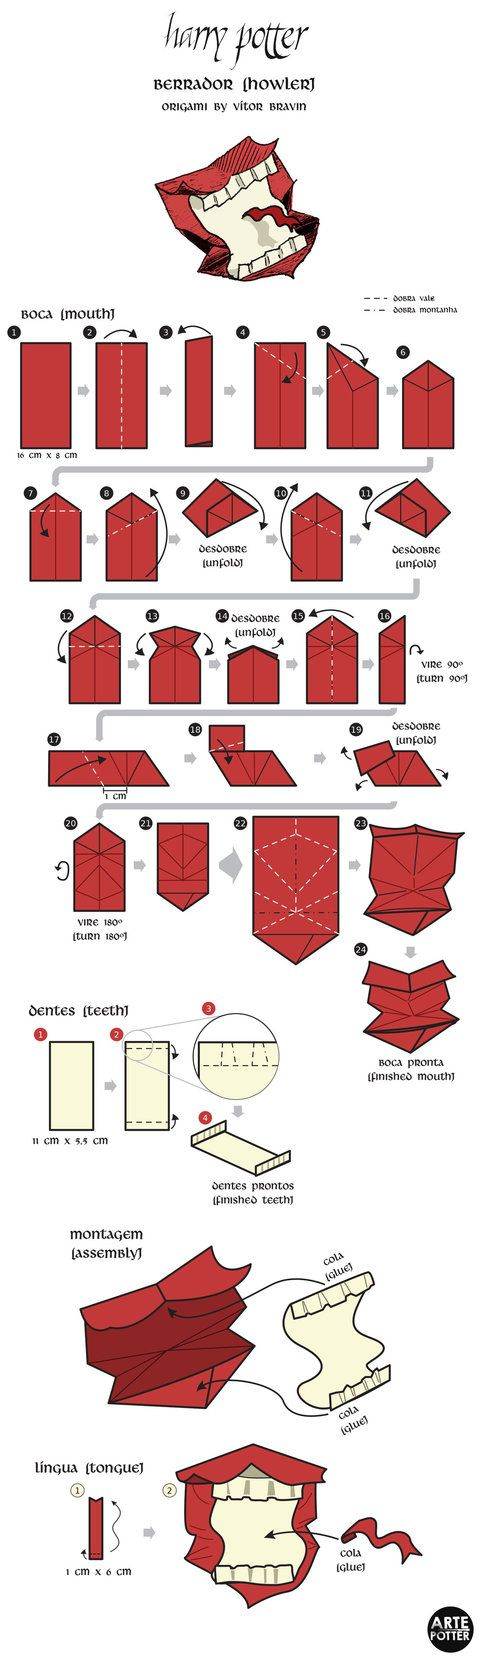 Origami Design - Howler by vitorbravin #HarryPotter